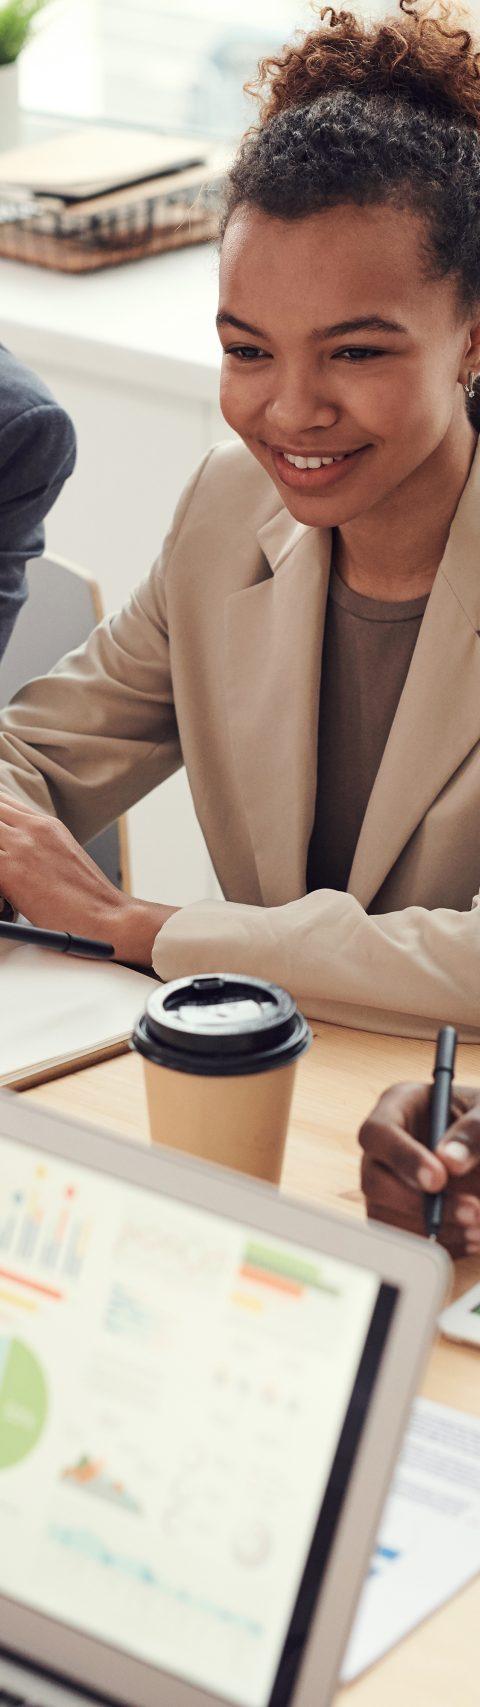 Business Idea 7 questions